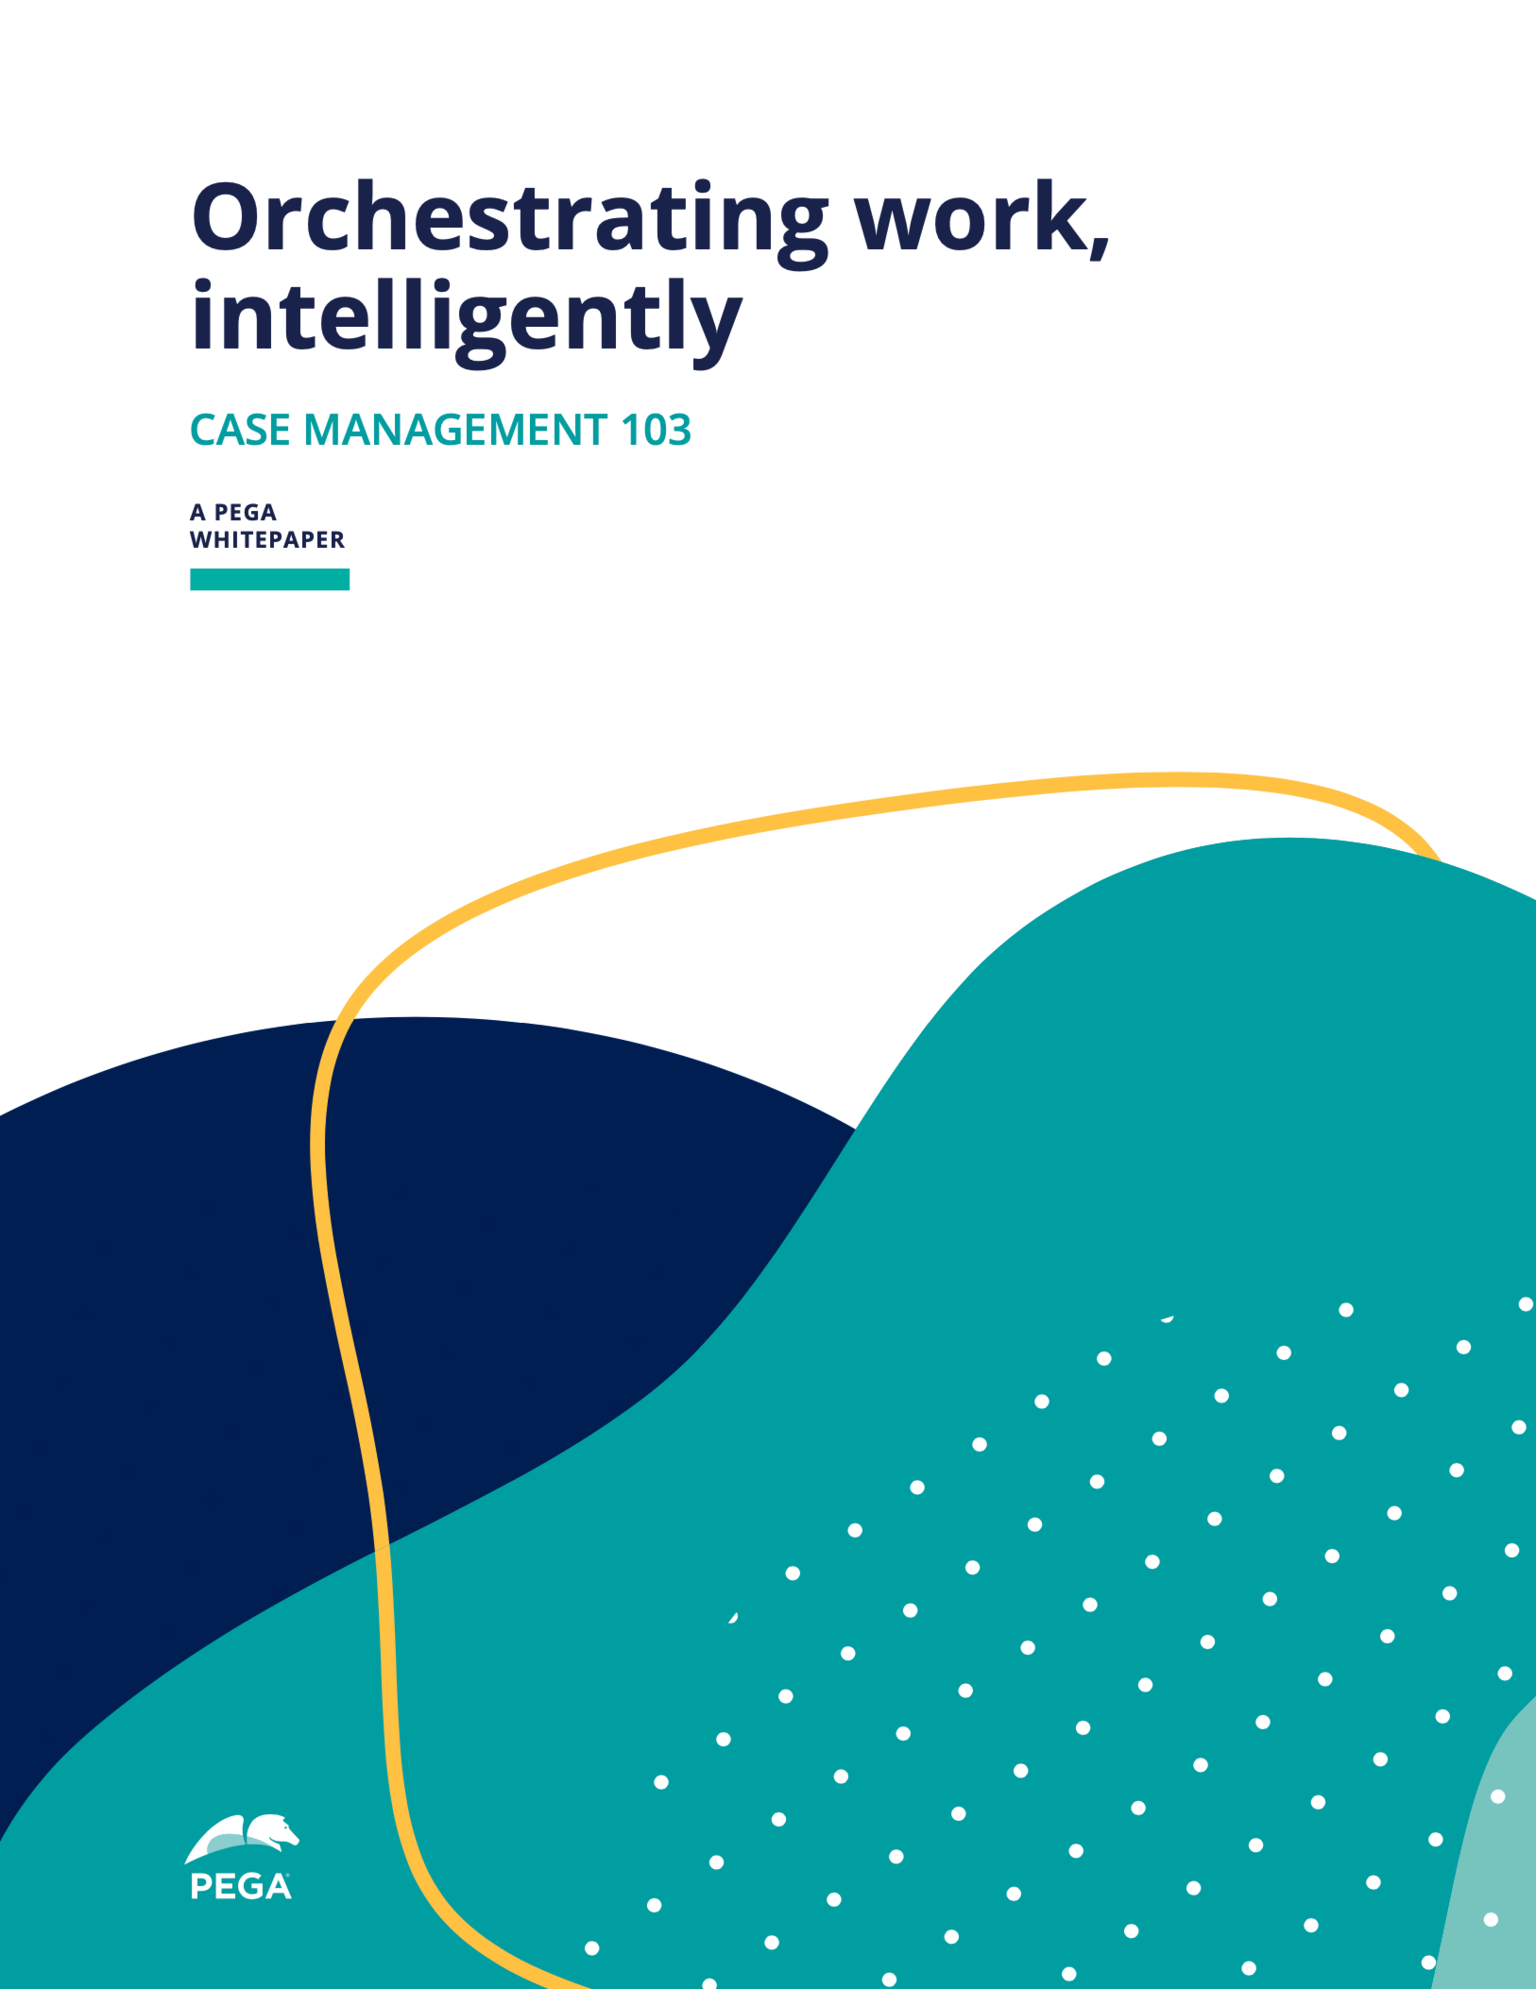 Orchestrating work intelligently asset image